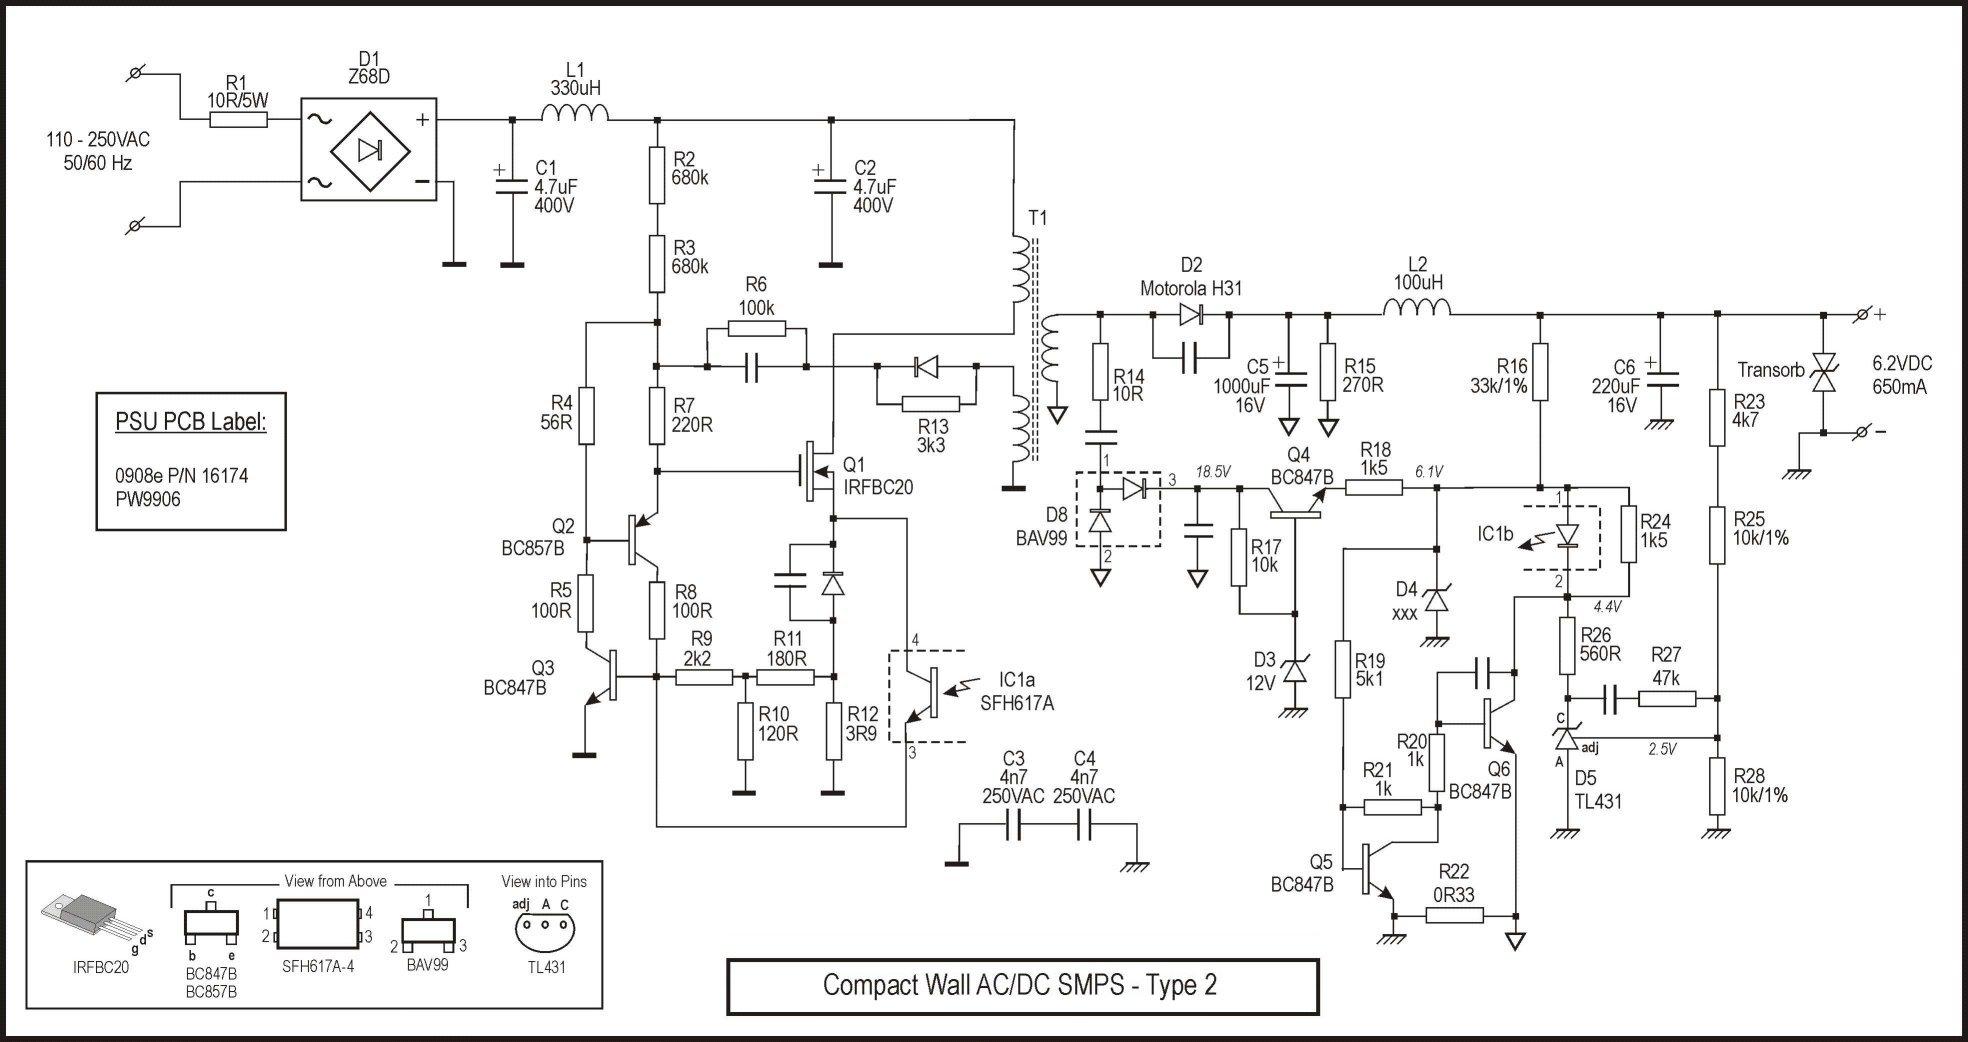 24v Battery Charger Circuit Diagram 20v Regulated Power Supply Powersupplycircuit